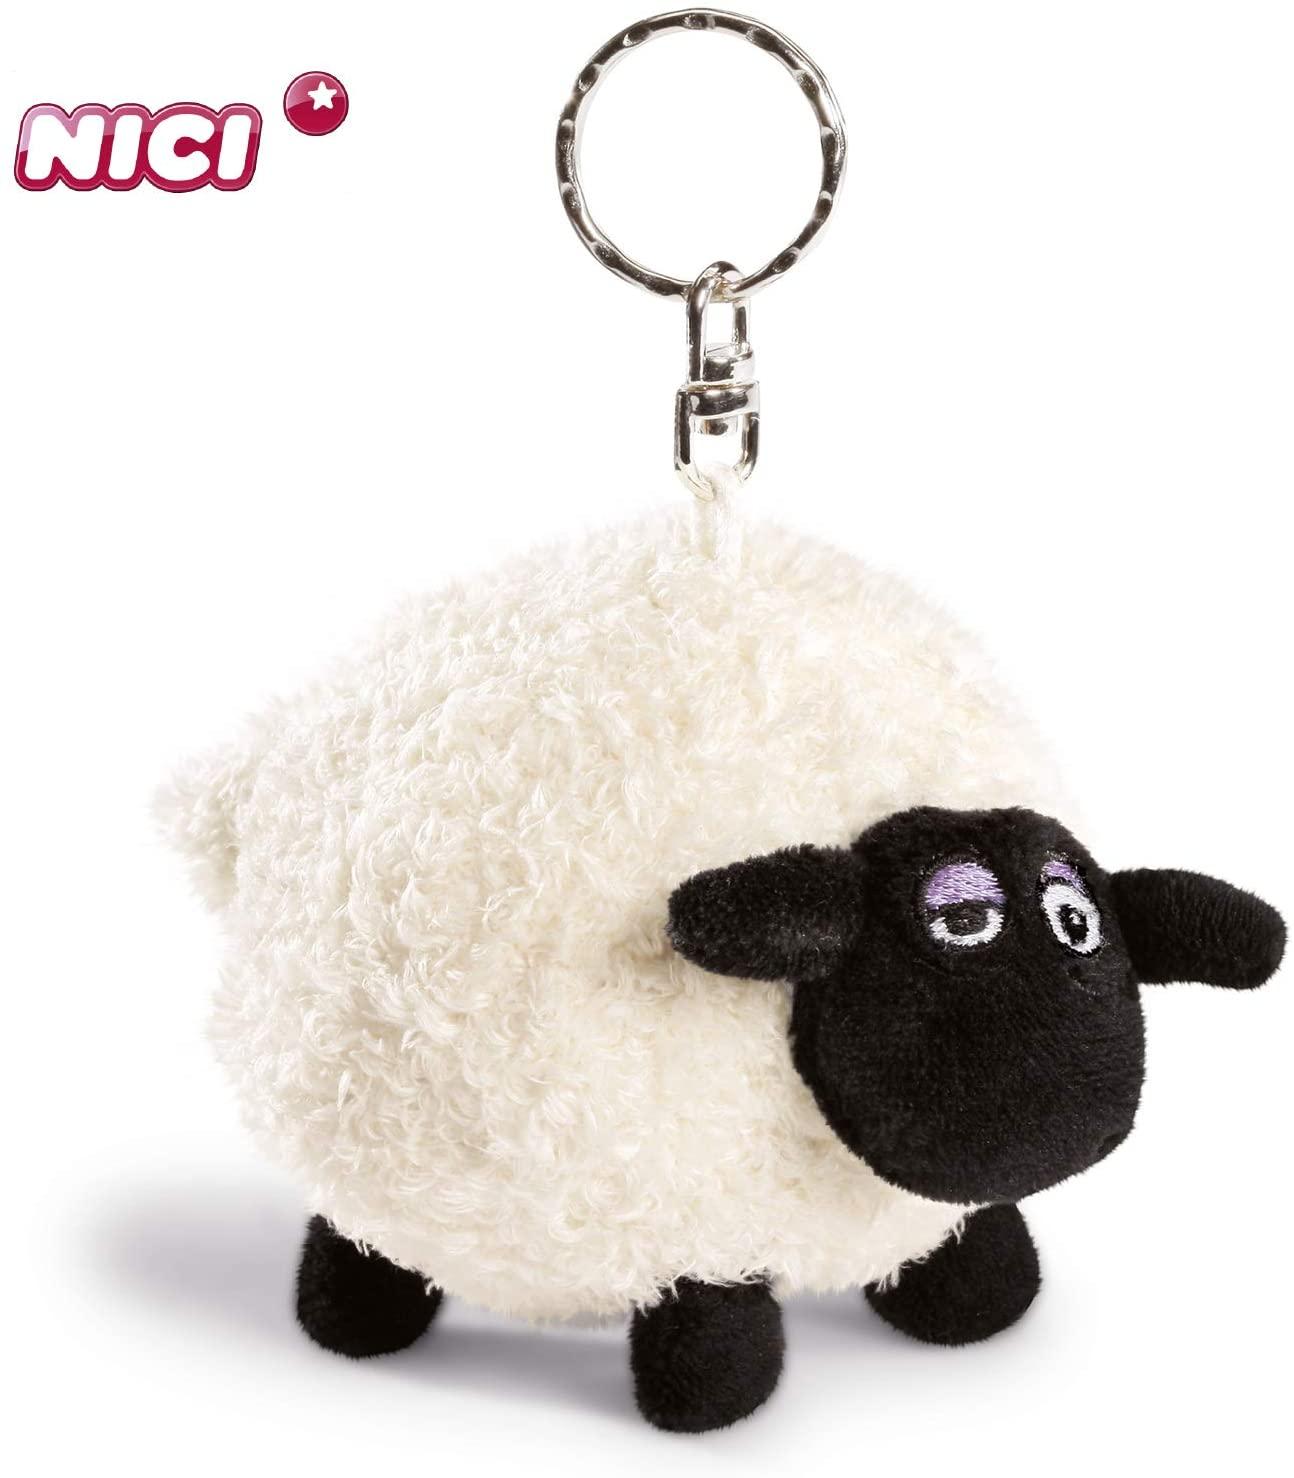 NICI Sheep Key Ring 'Shirley'